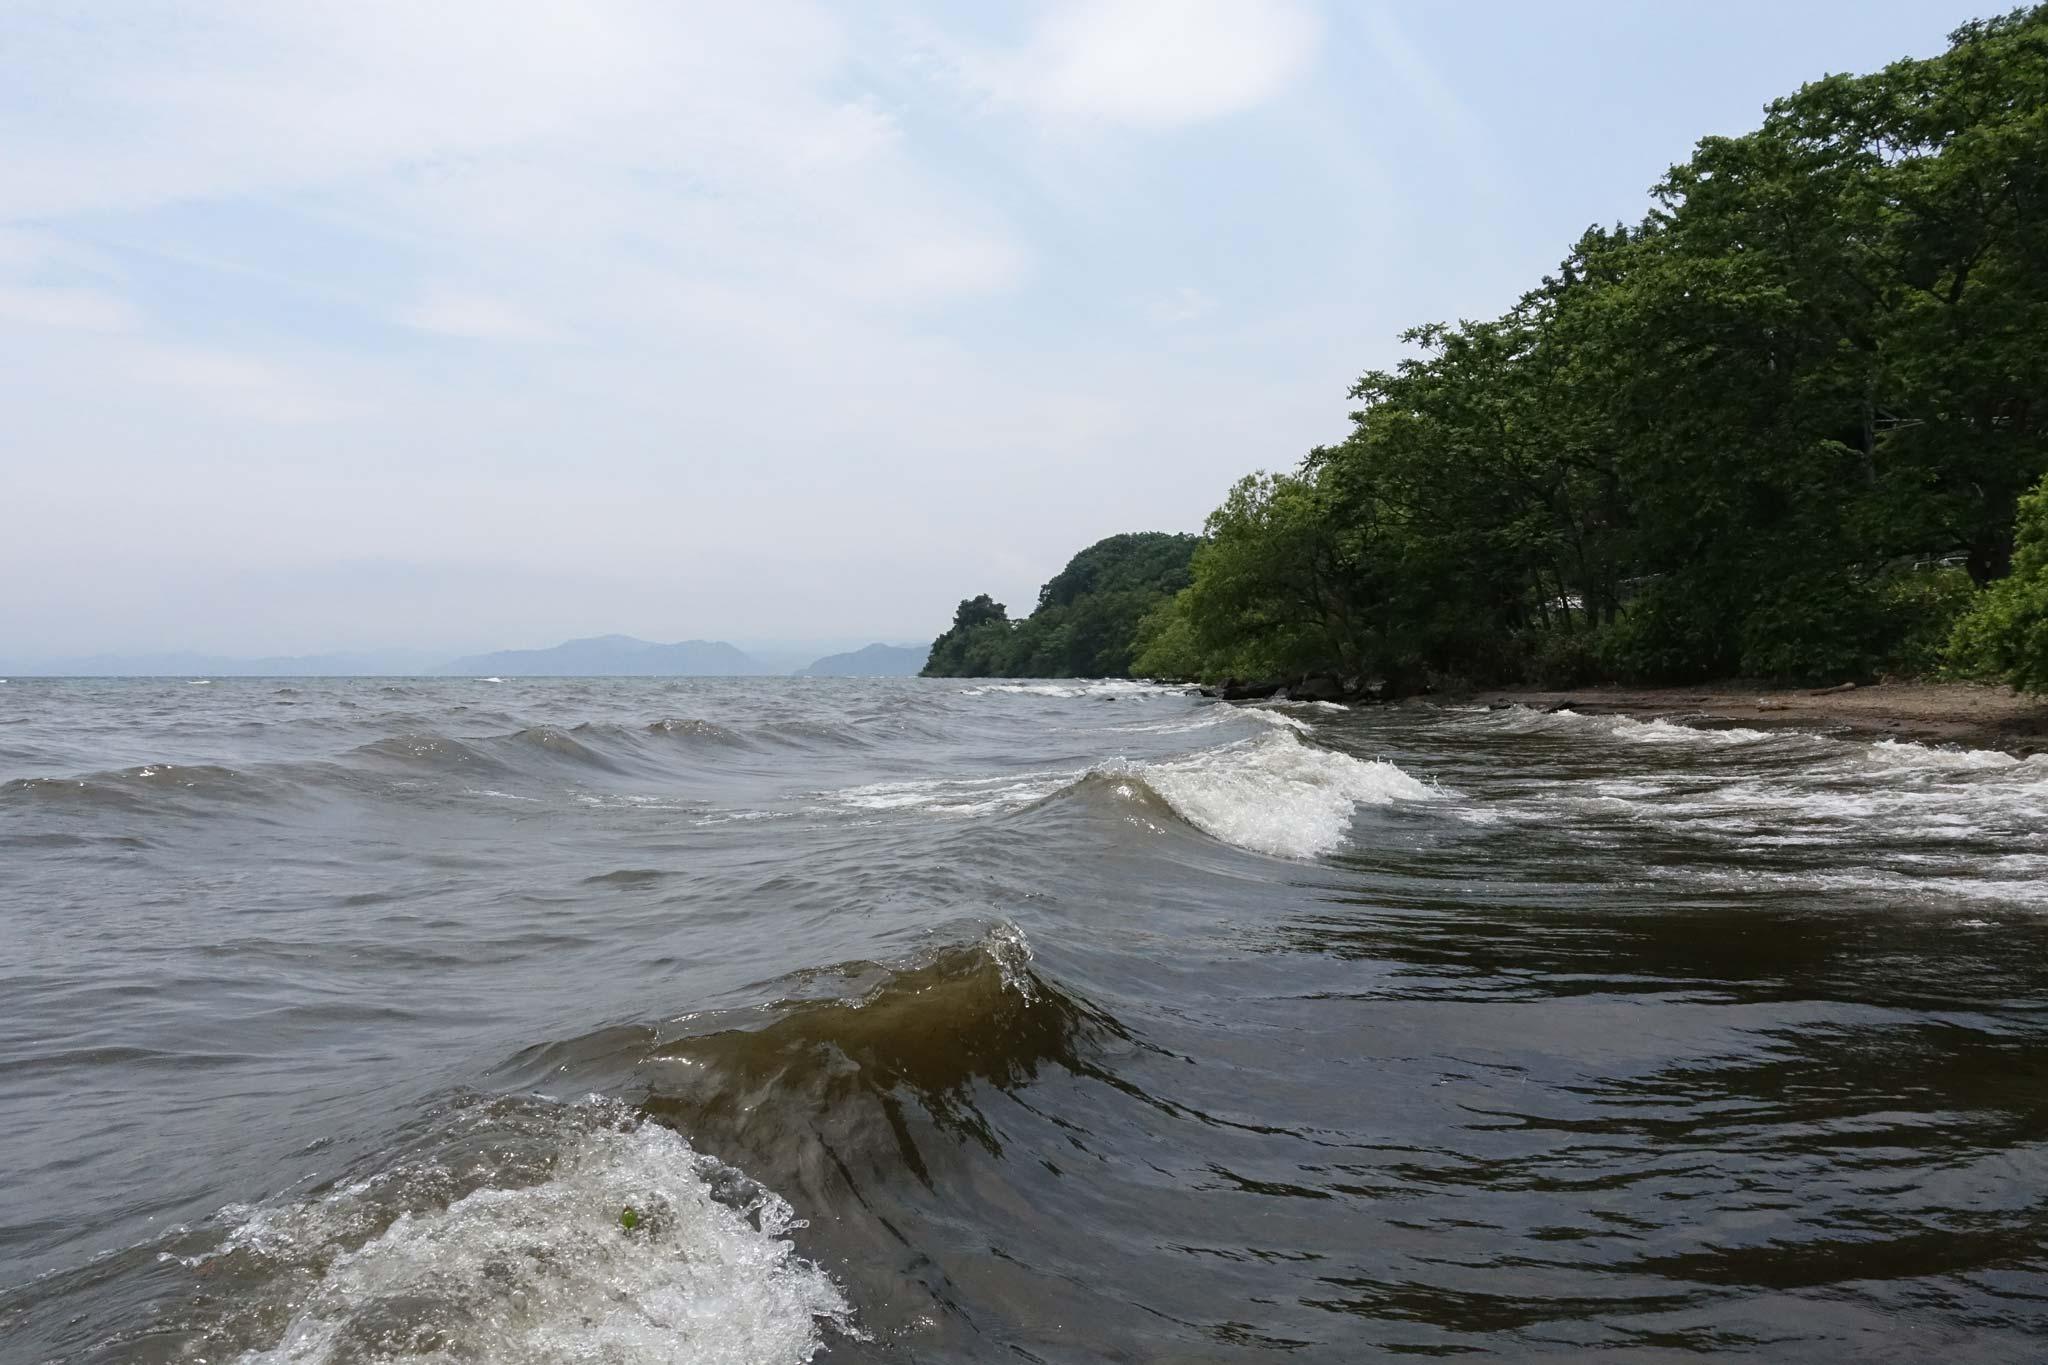 Lake Inawashiro